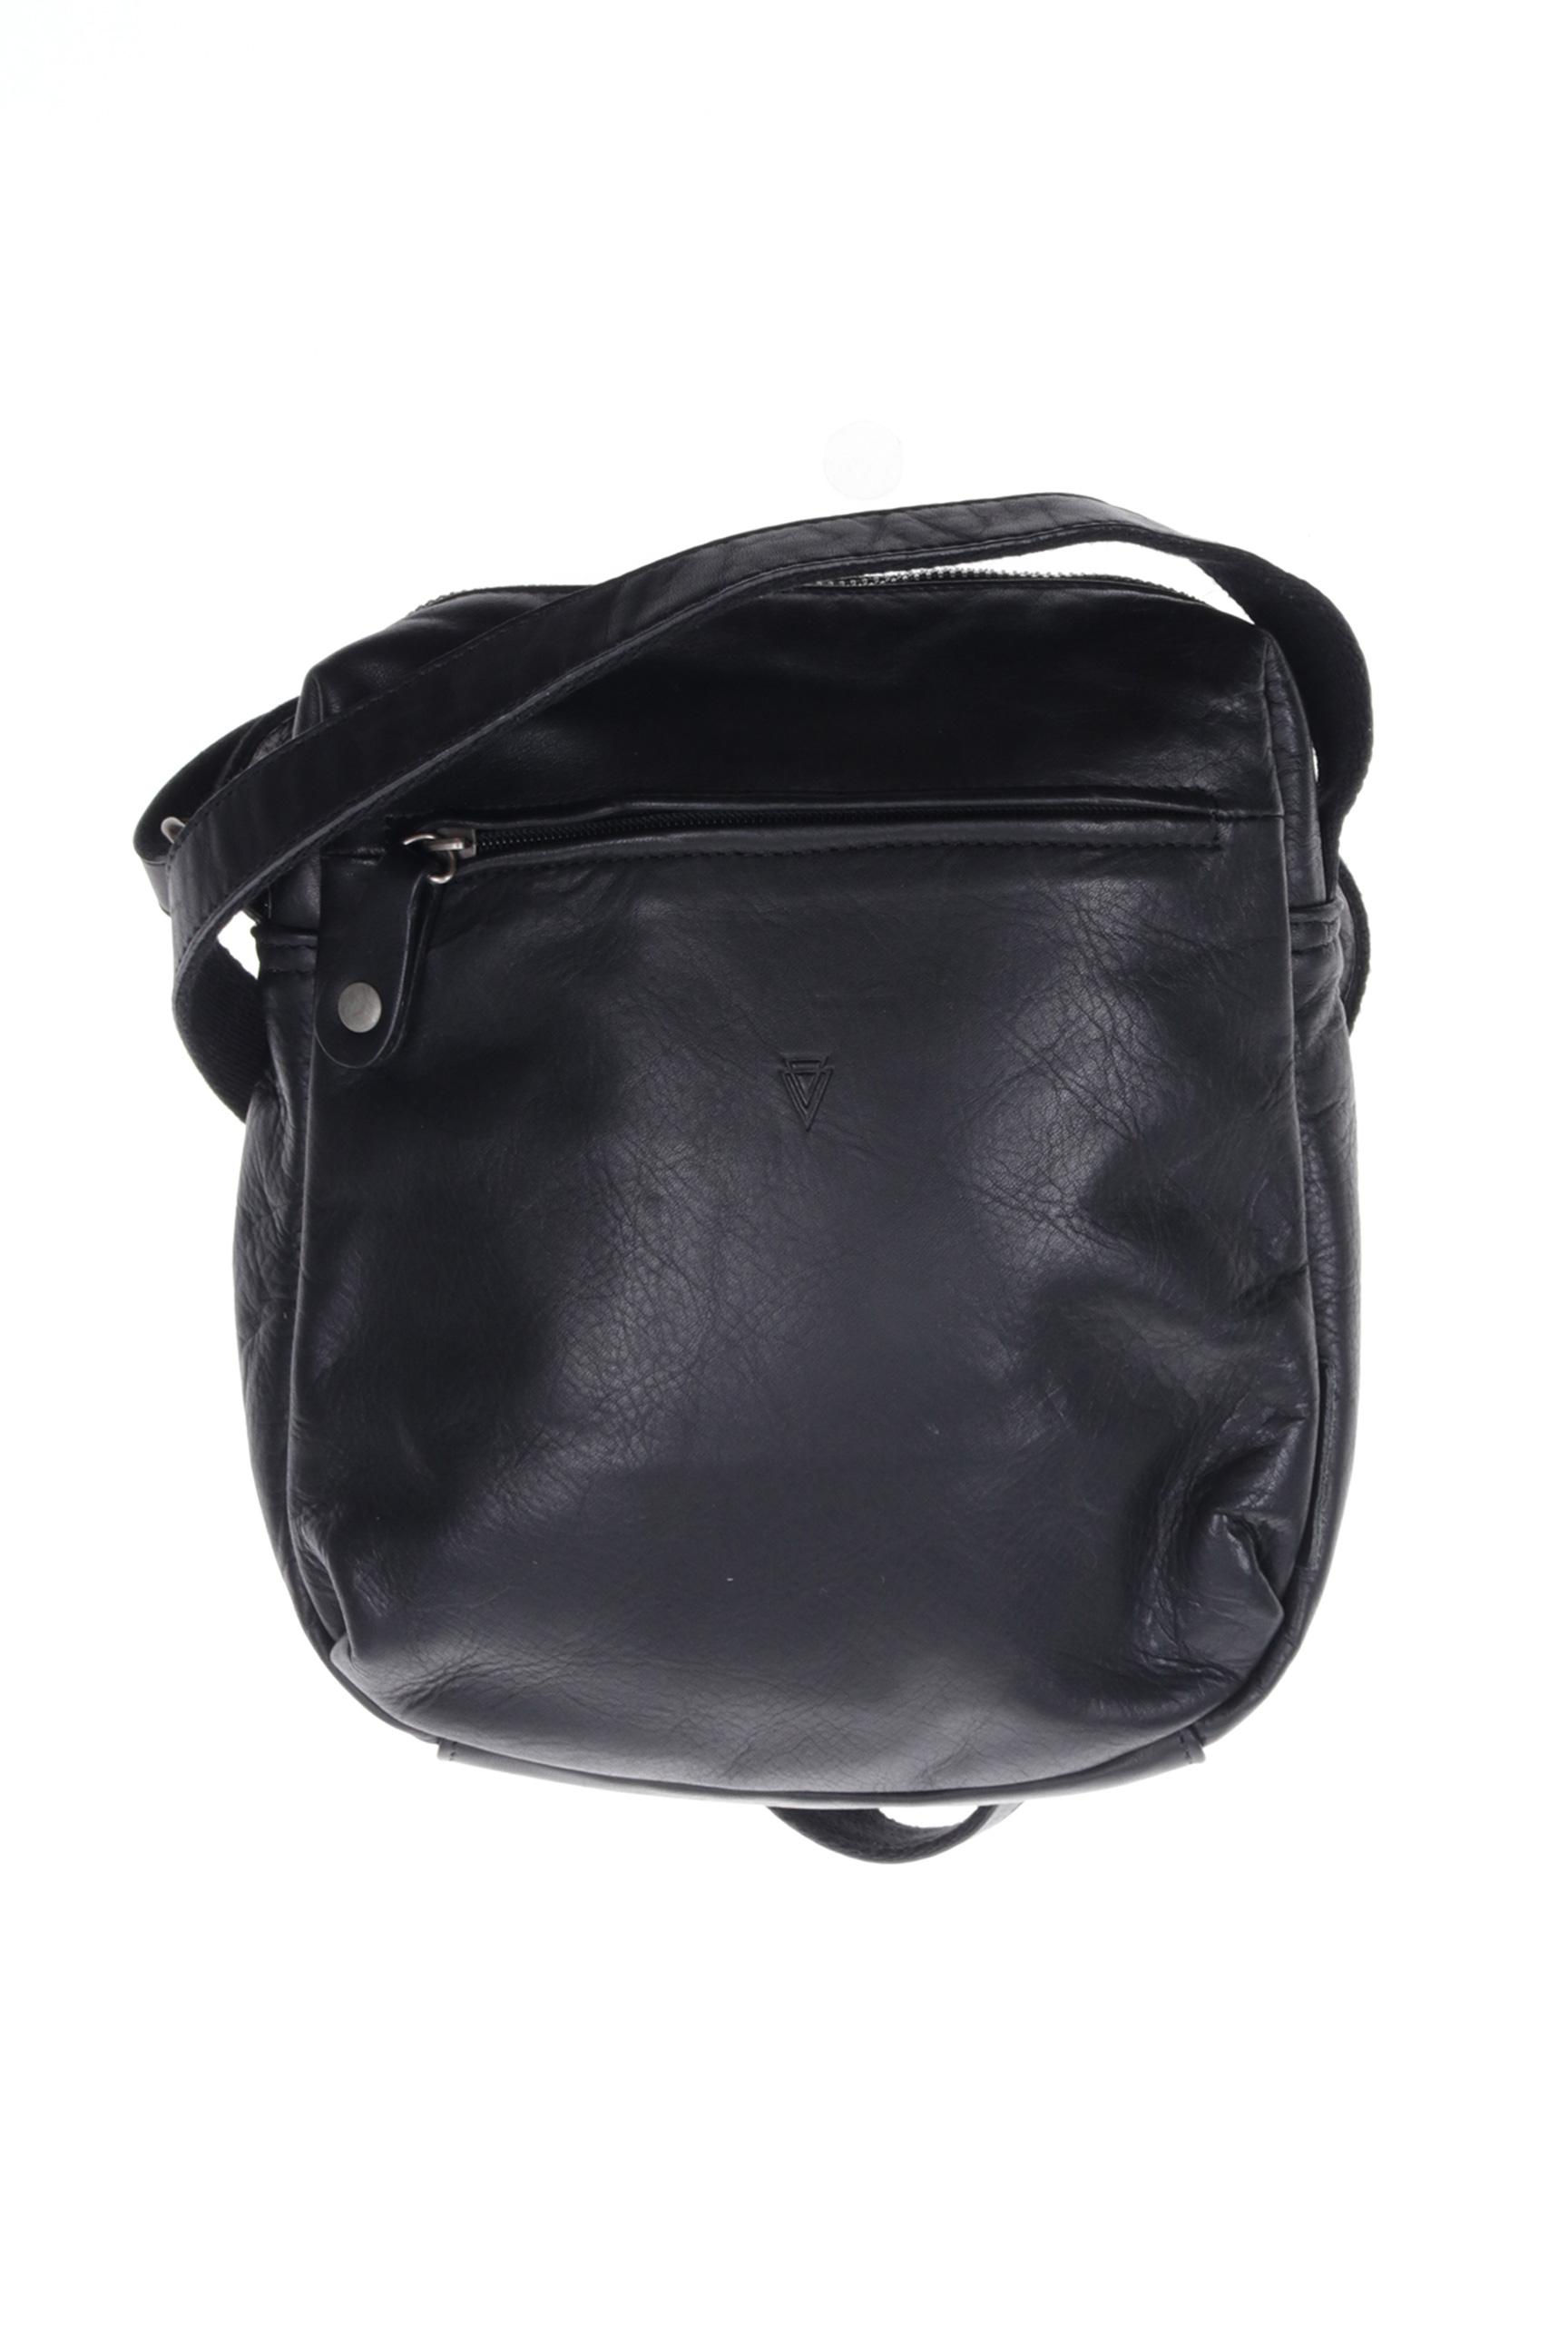 Sac femme Aperture noir taille : TU 60 FR (FR)